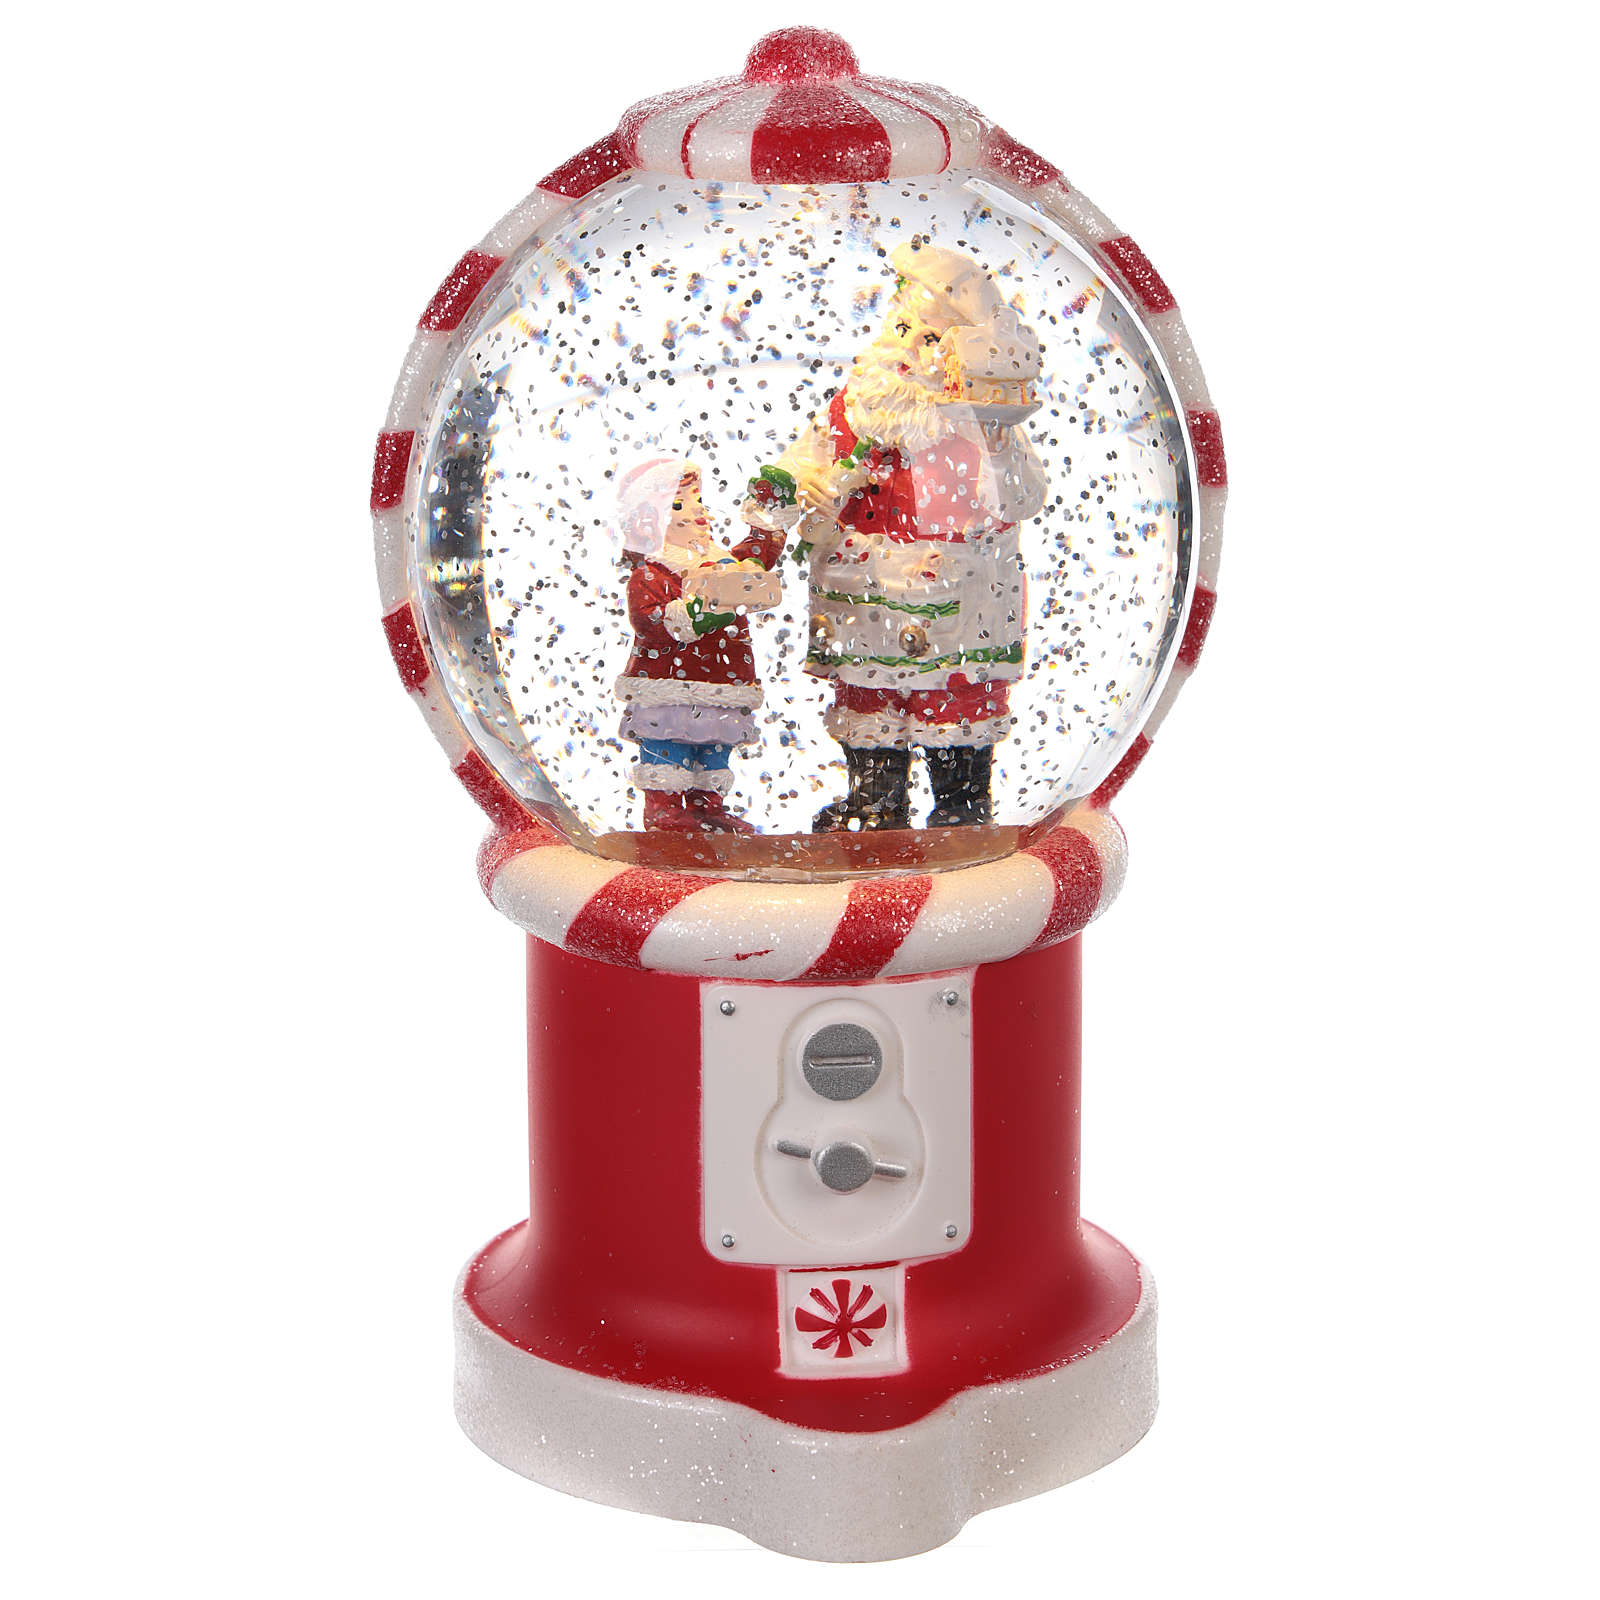 Candy dispenser snow globe with Santa Claus 20x10 cm 3